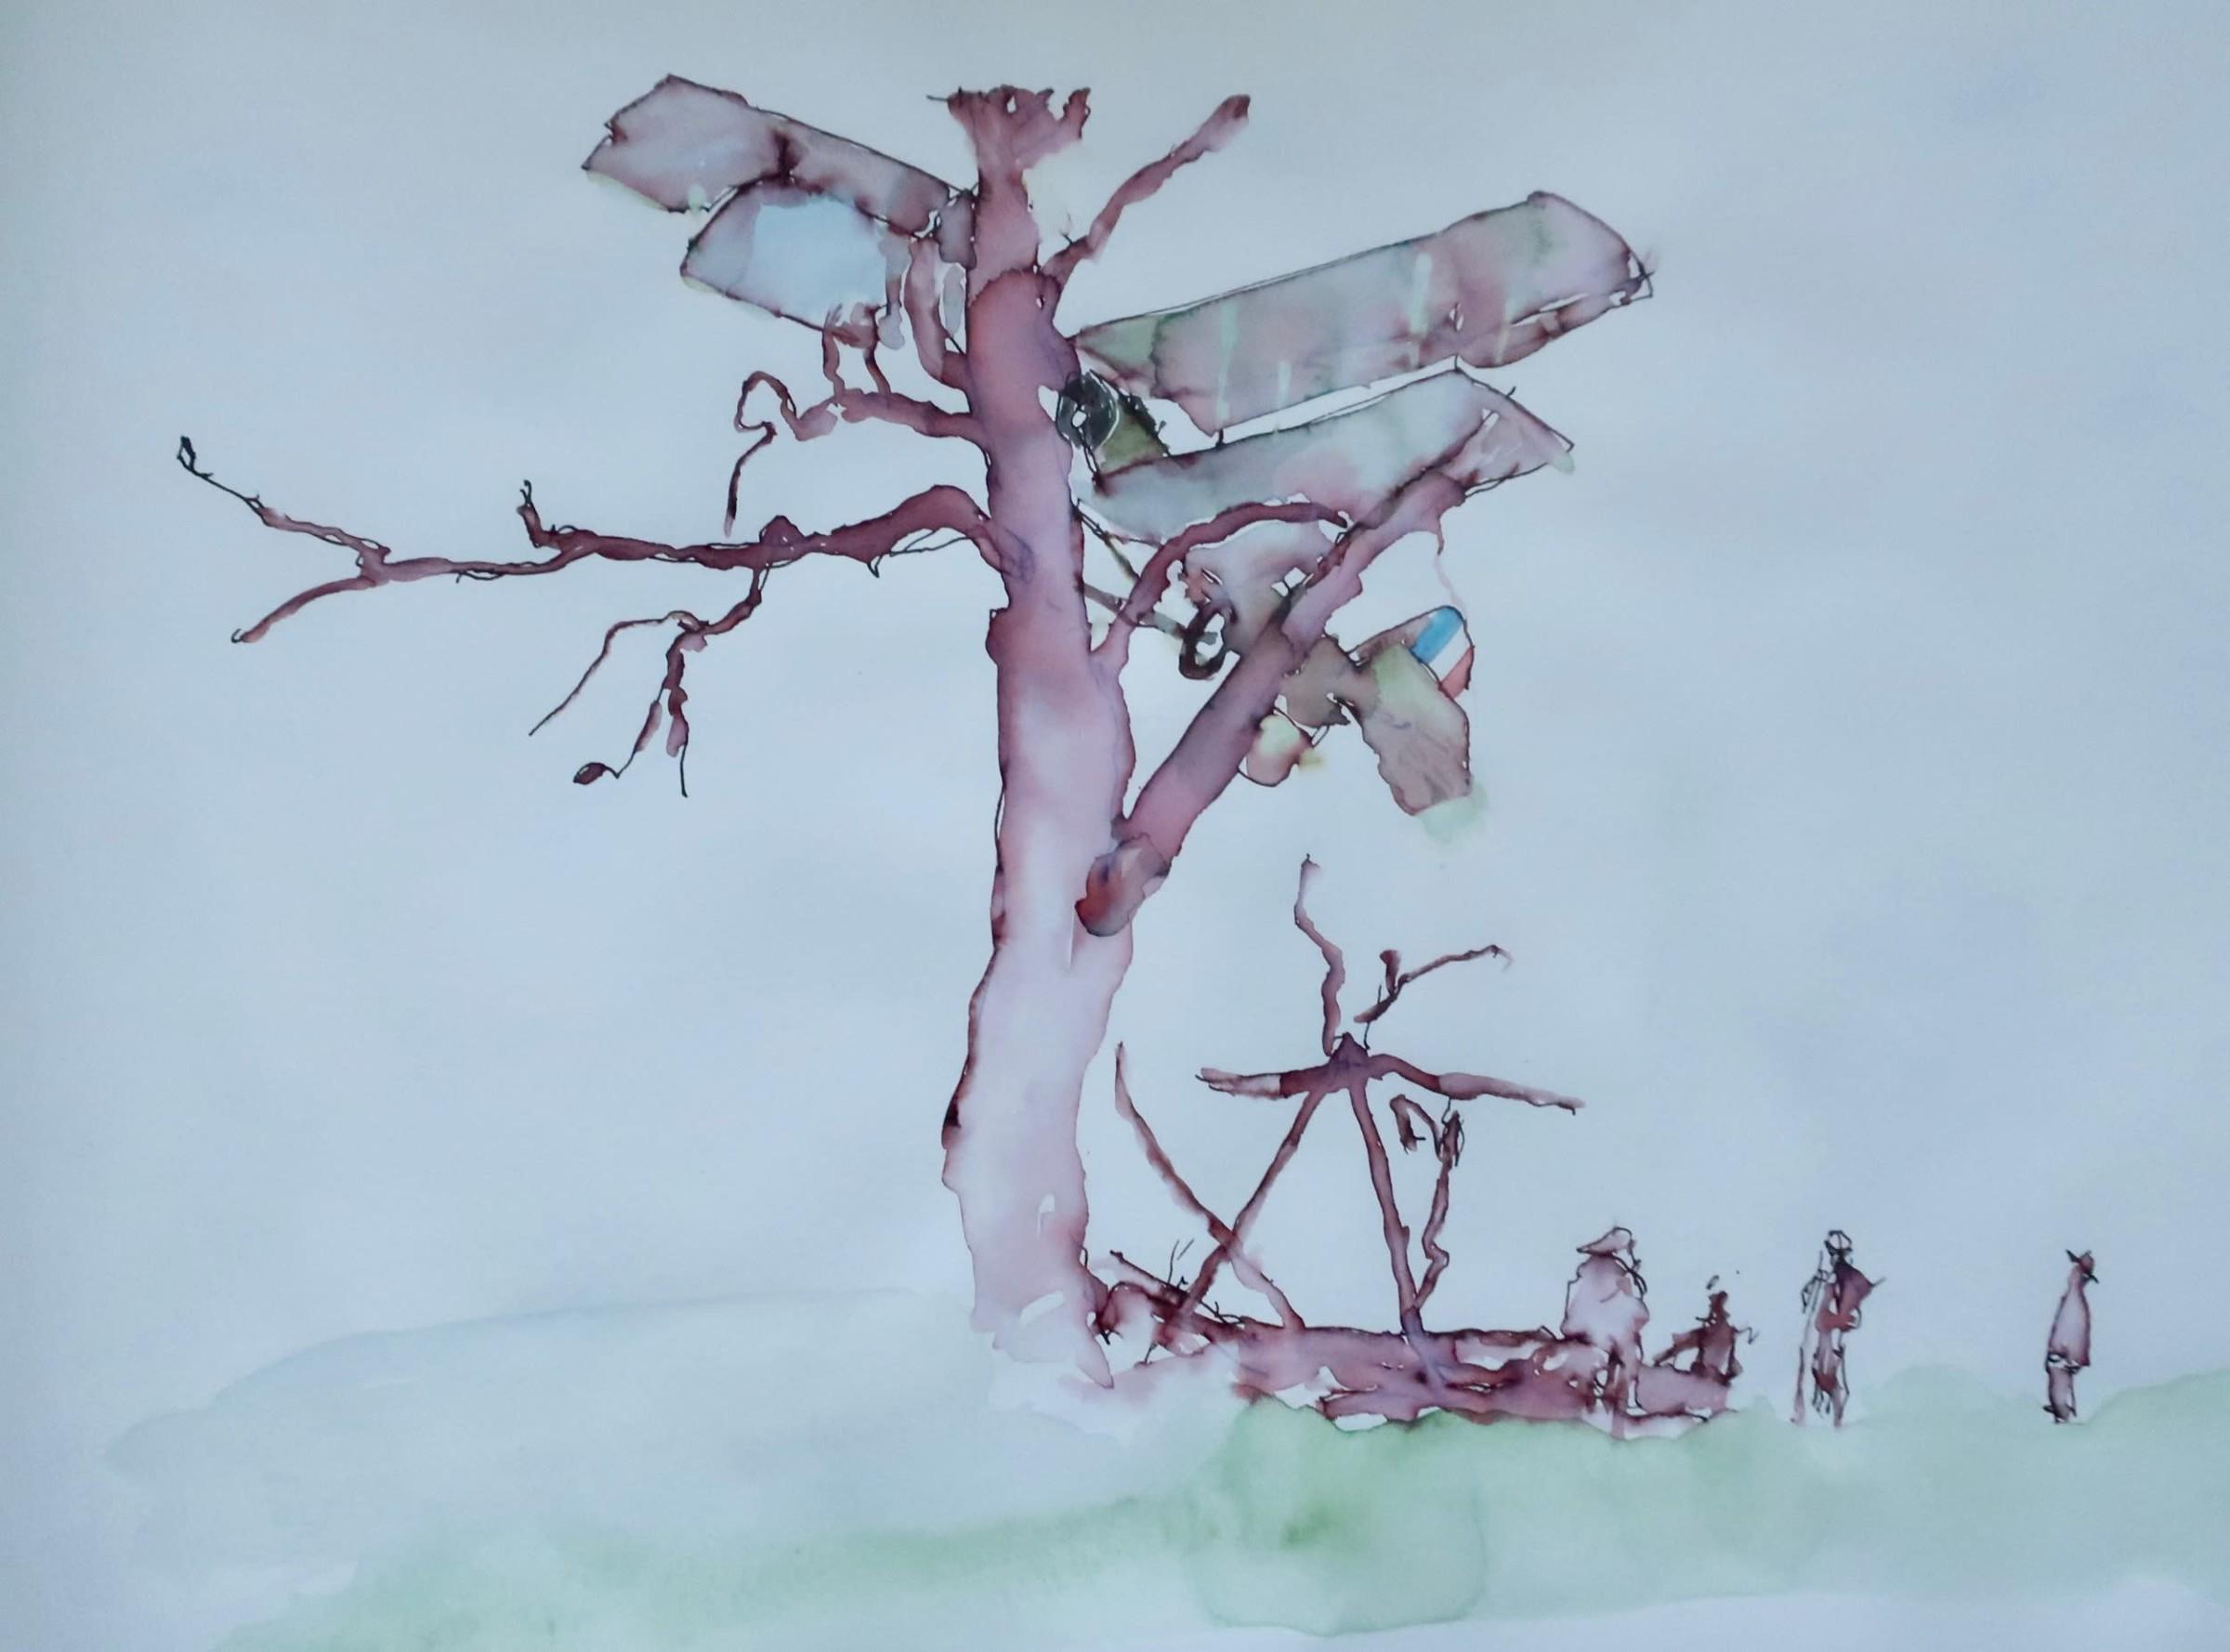 "<span class=""link fancybox-details-link""><a href=""/artists/134-david-hamilton/works/12741-david-hamilton-tree-landing/"">View Detail Page</a></span><div class=""artist""><span class=""artist""><strong>David Hamilton</strong></span></div><div class=""title""><em>Tree Landing</em></div><div class=""medium"">ink & watercolour on paper</div><div class=""dimensions"">Frame: 43 x 53cm<br /> Artwork: 27 x 34cm</div><div class=""price"">£600.00</div>"